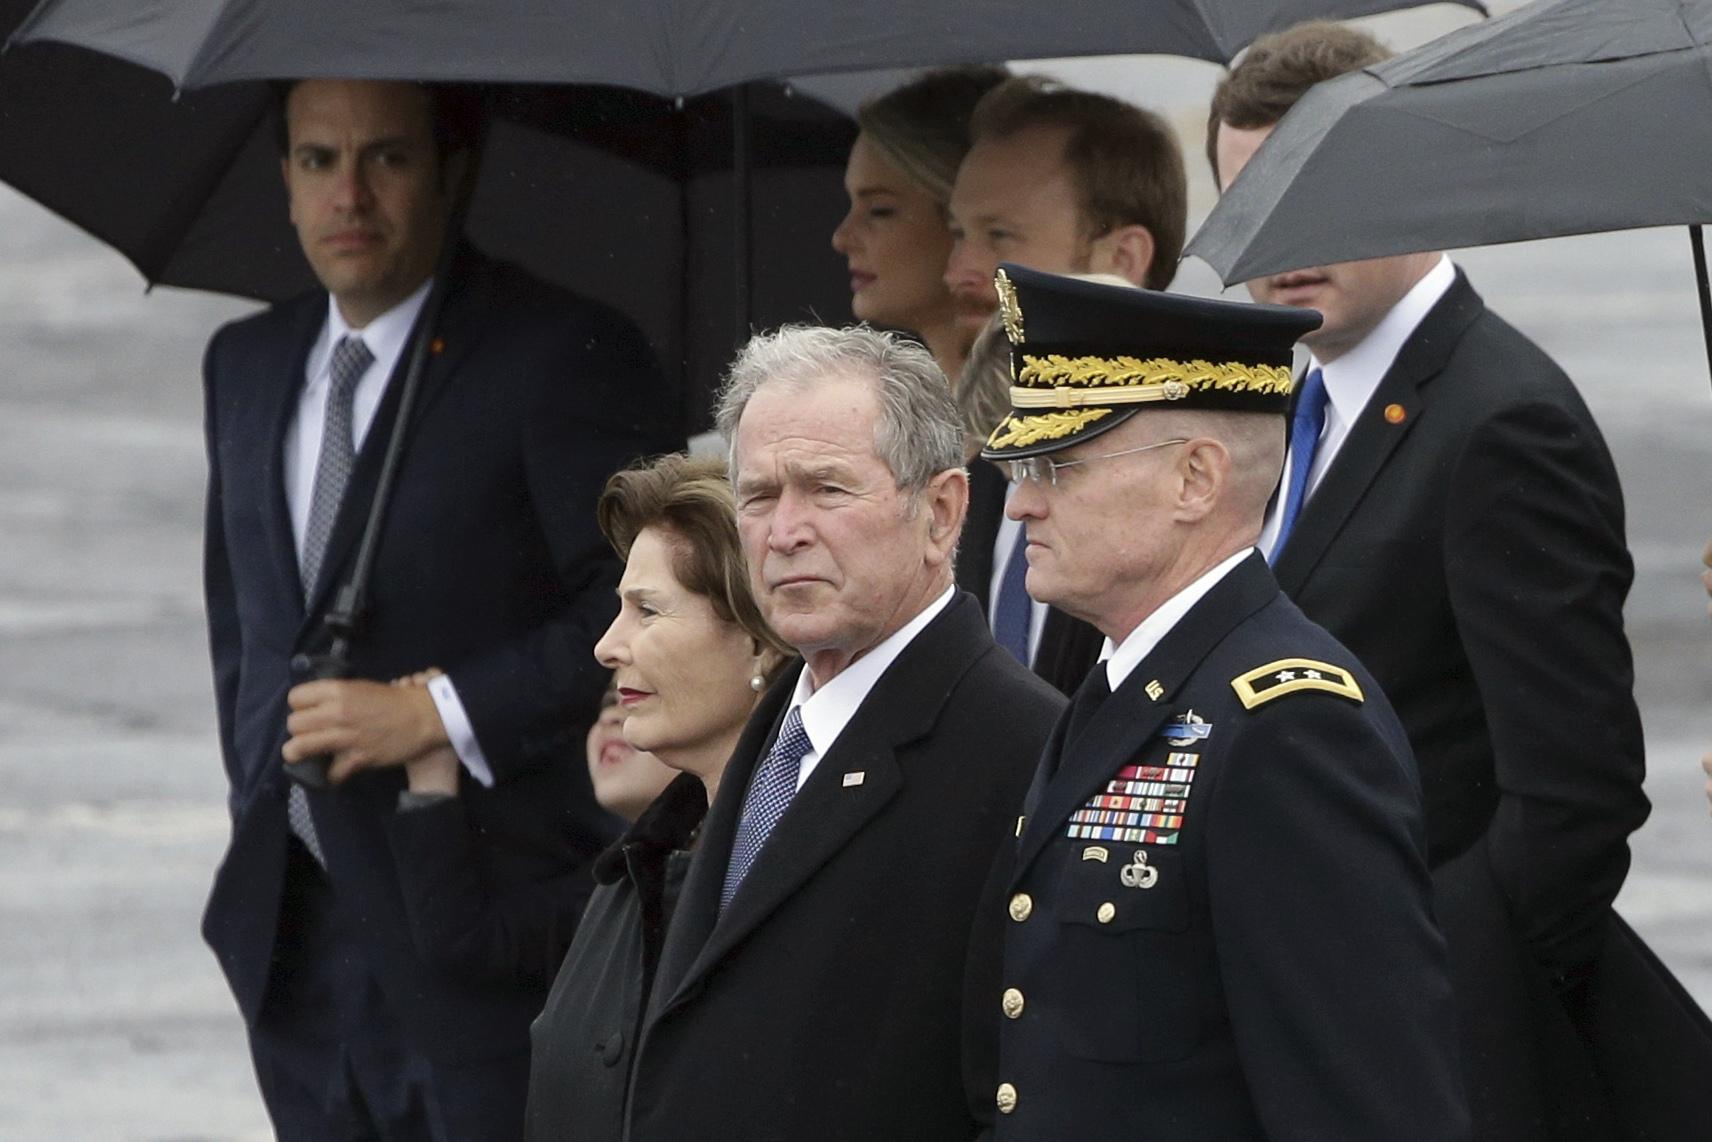 George W. Bush praises borders, calls for immigration amnesty